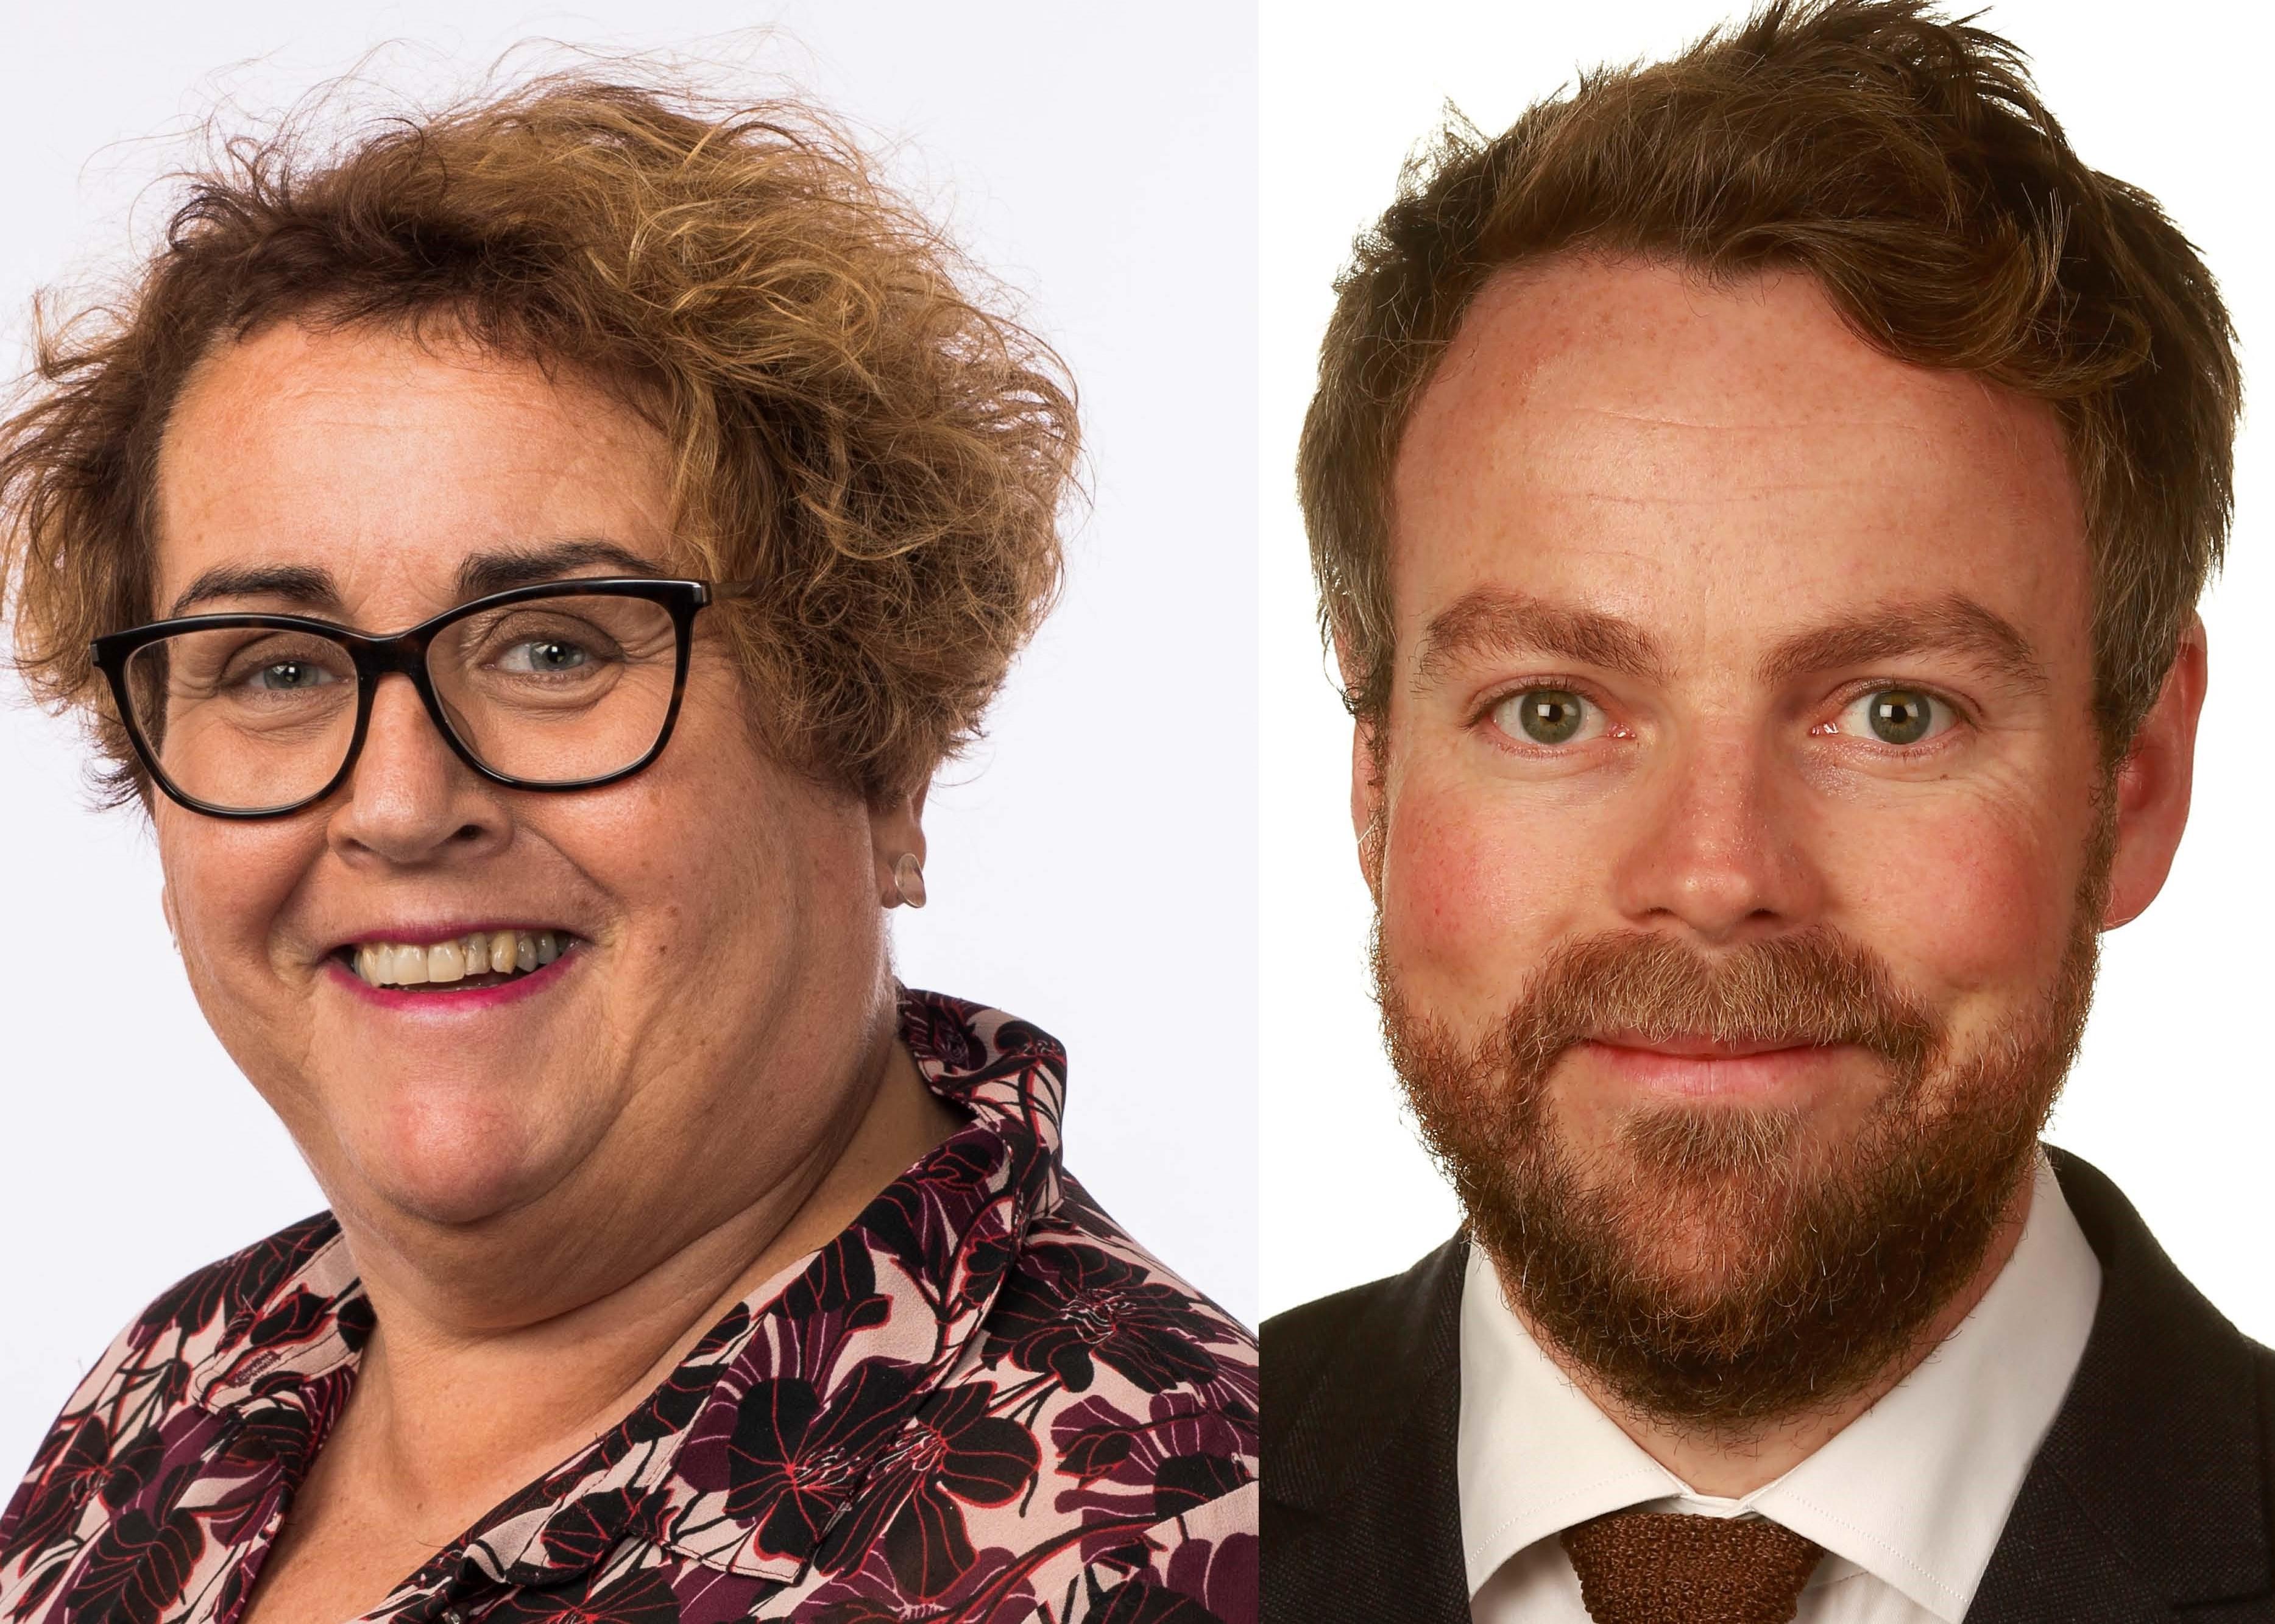 Anbud365: Utvalg skal forberede norsk «gevinsttak» for private i offentlige velferdstjenester